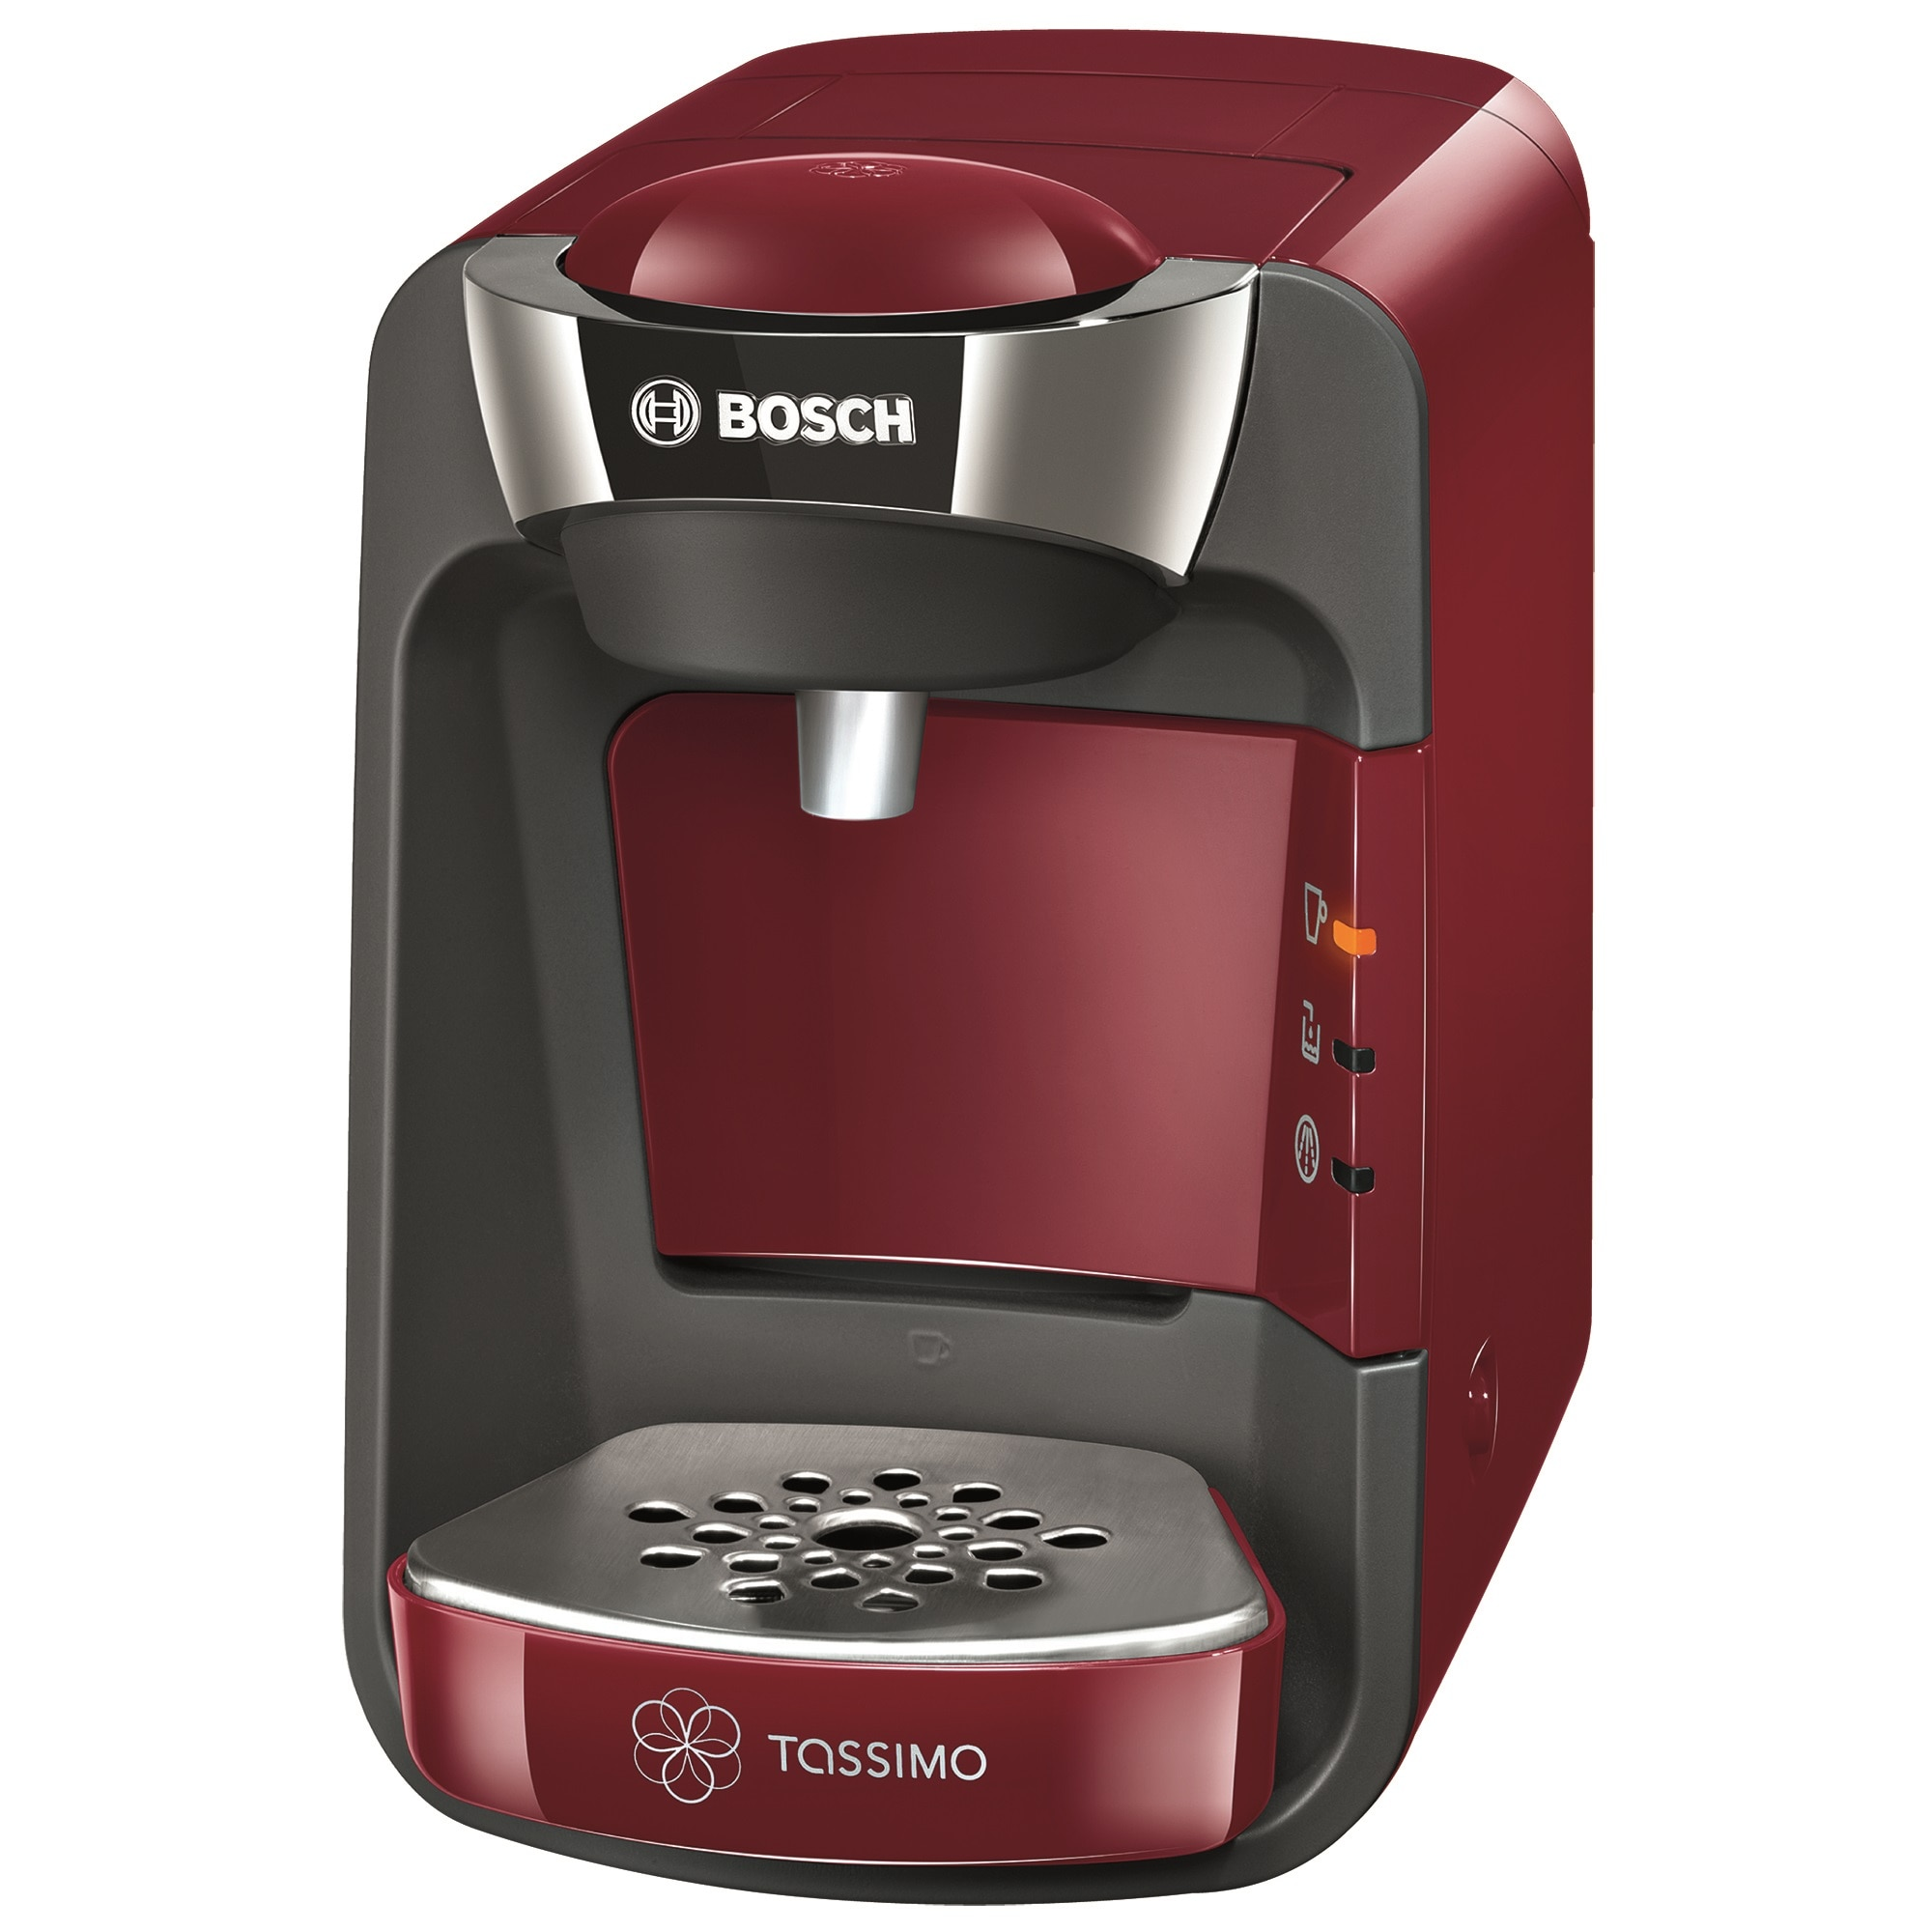 Fotografie Espressor Bosch Tassimo Suny TAS 3203, 1300 W, 3.3 bar, 0.8 l, Capsule, Rosu